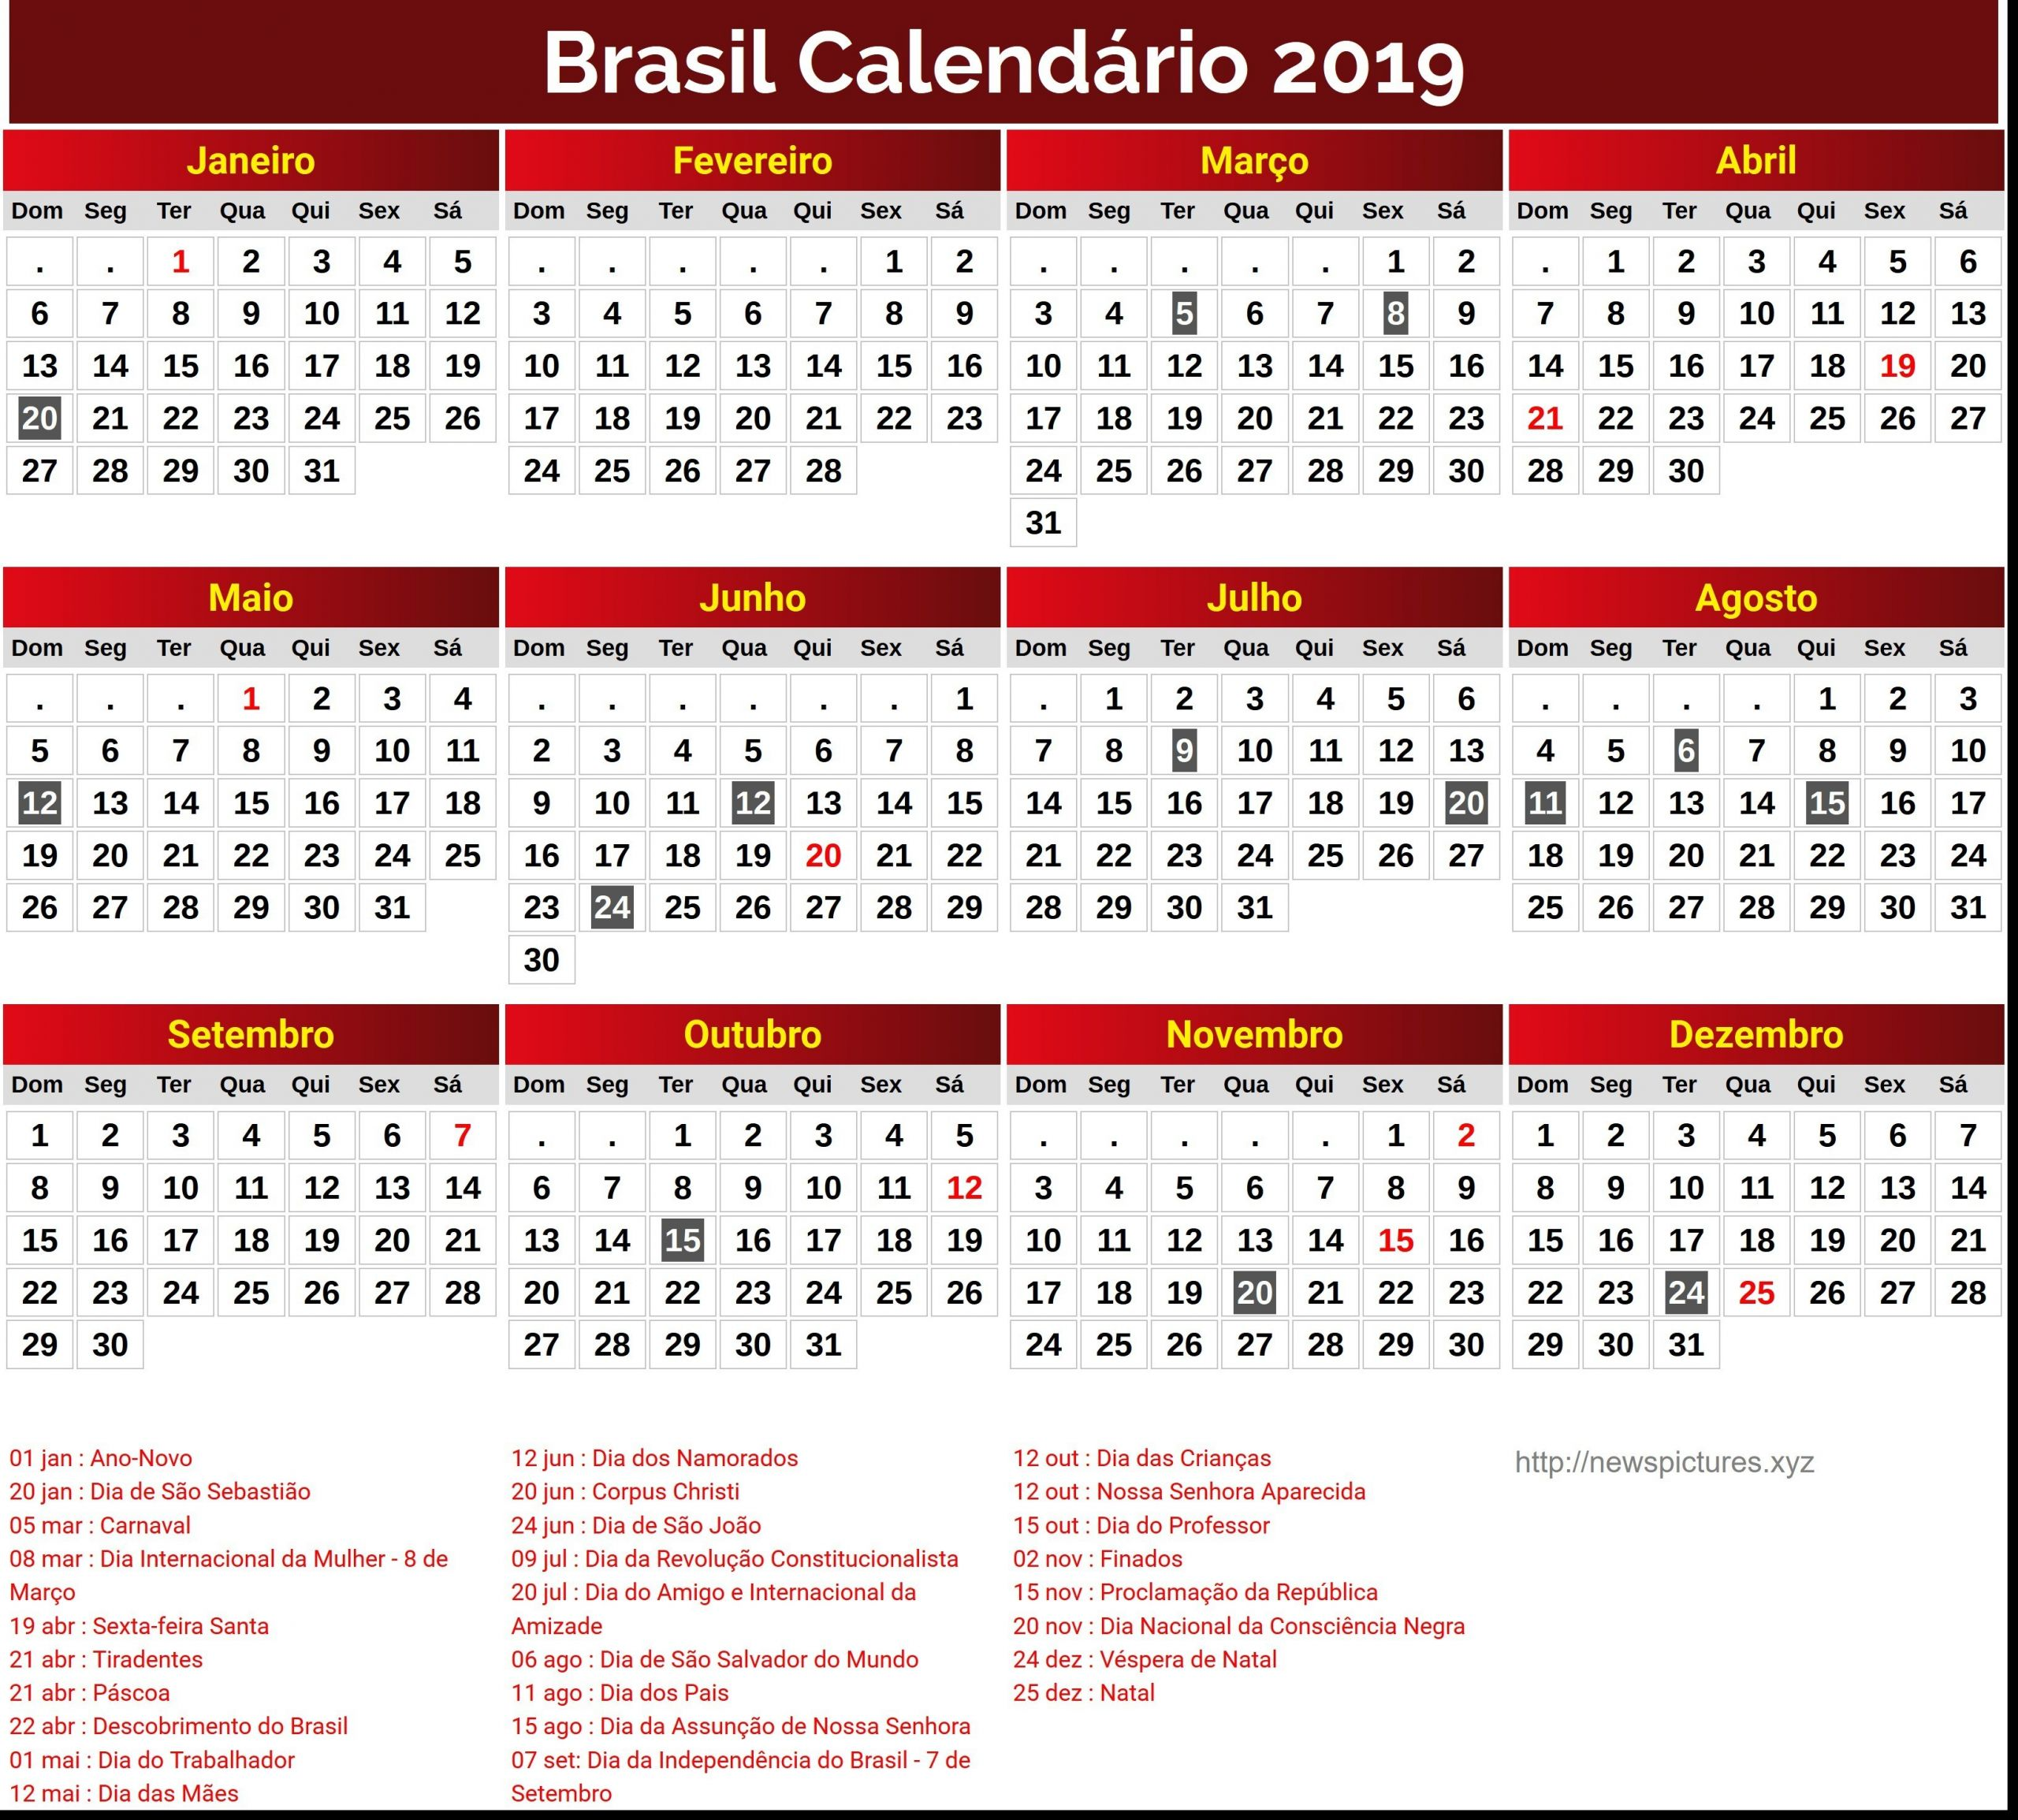 calendario 2019 para imprimir argentina con feriados gratis mas caliente evaluar calendario 2019 con sus feriados of calendario 2019 para imprimir argentina con feriados gratis